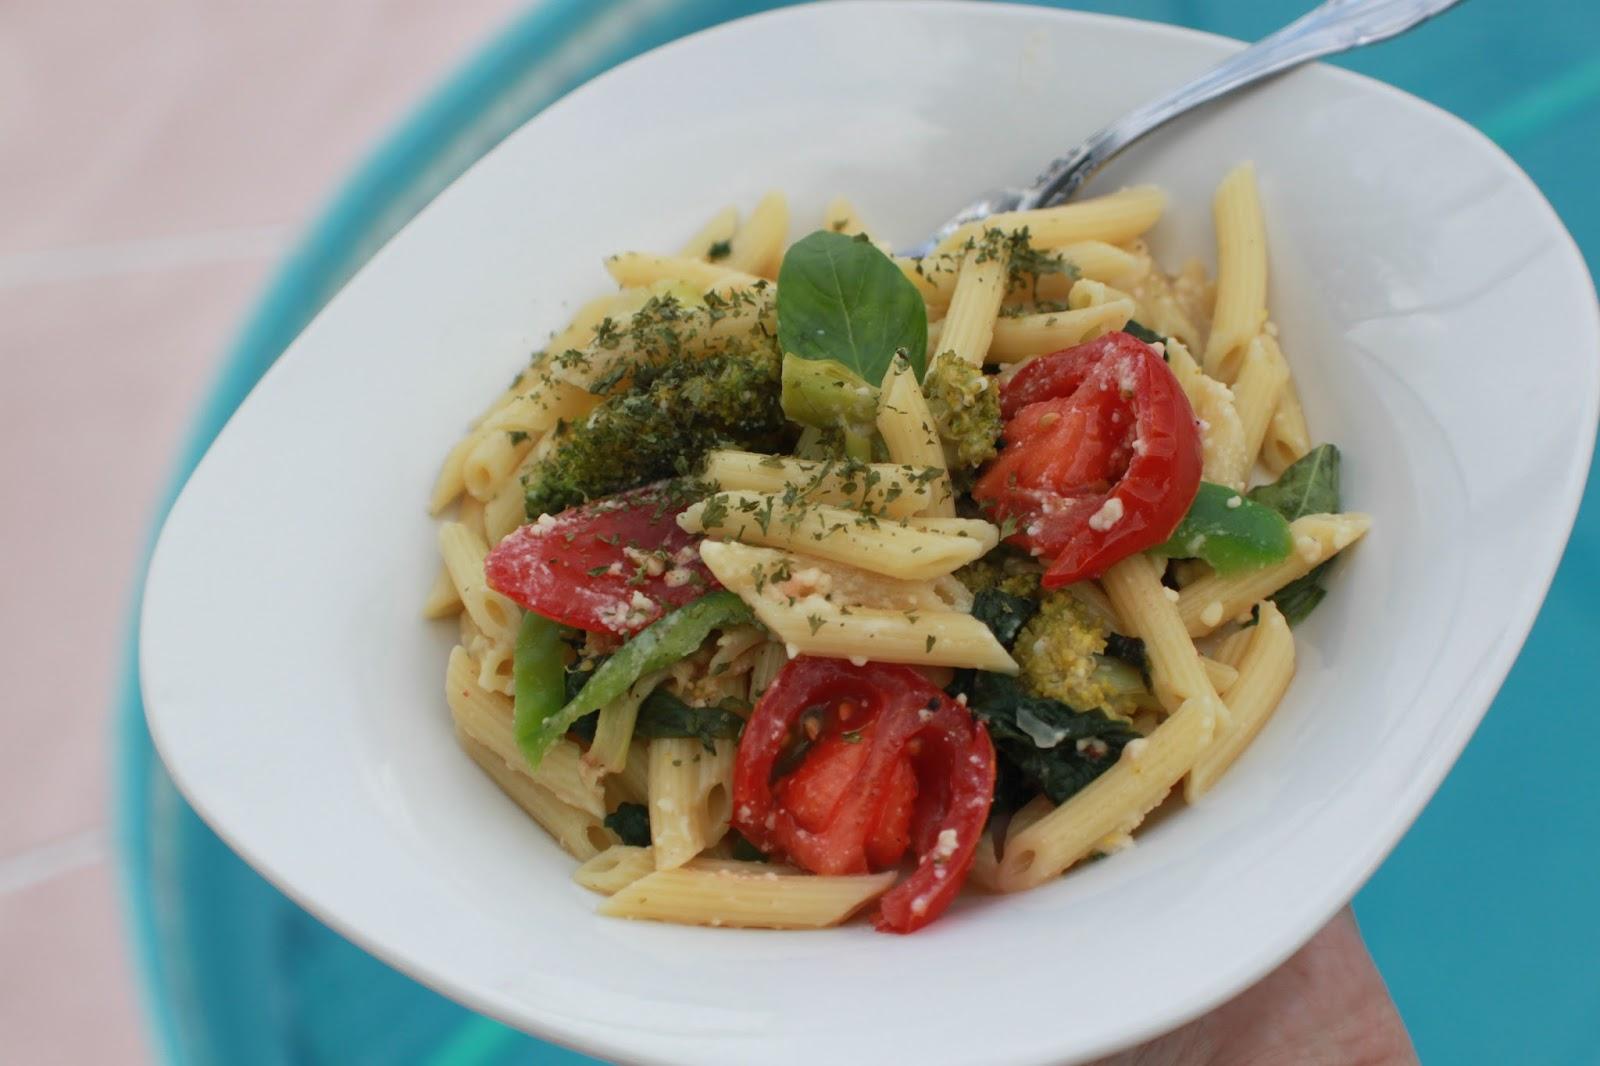 What's Cookin' Italian Style Cuisine: Tomato Feta Olive Pasta Recipe